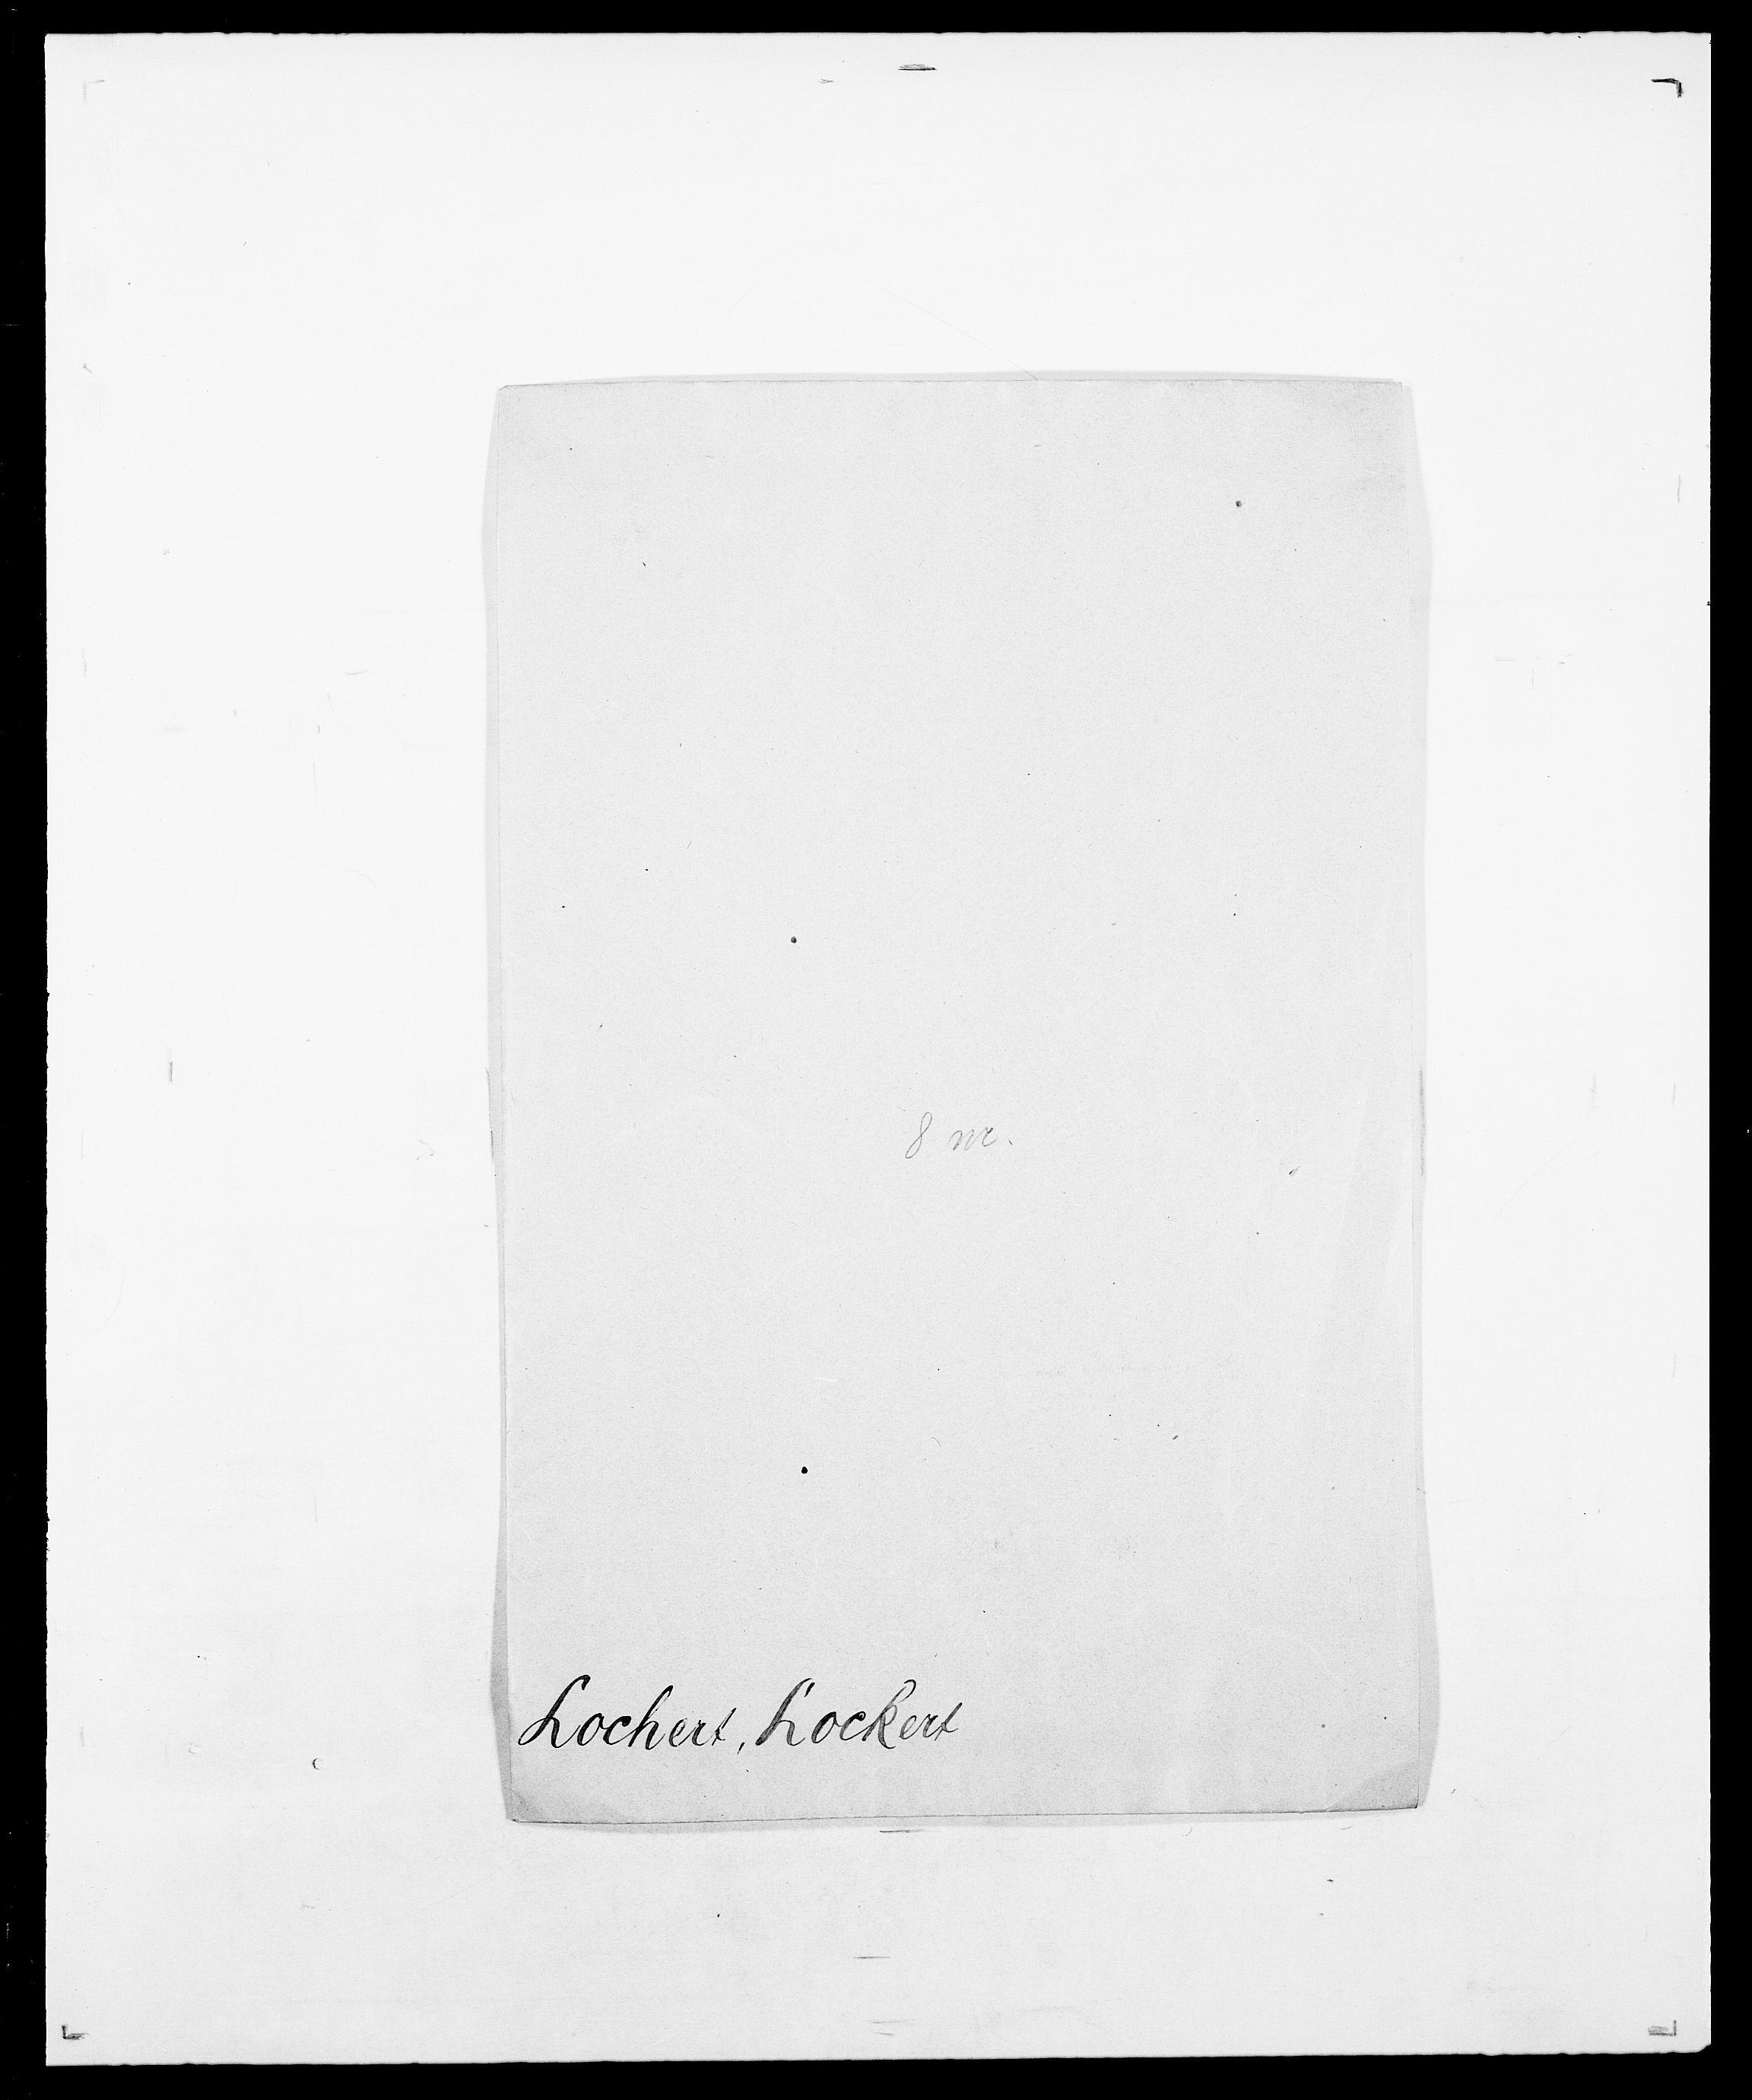 SAO, Delgobe, Charles Antoine - samling, D/Da/L0024: Lobech - Lærum, s. 12